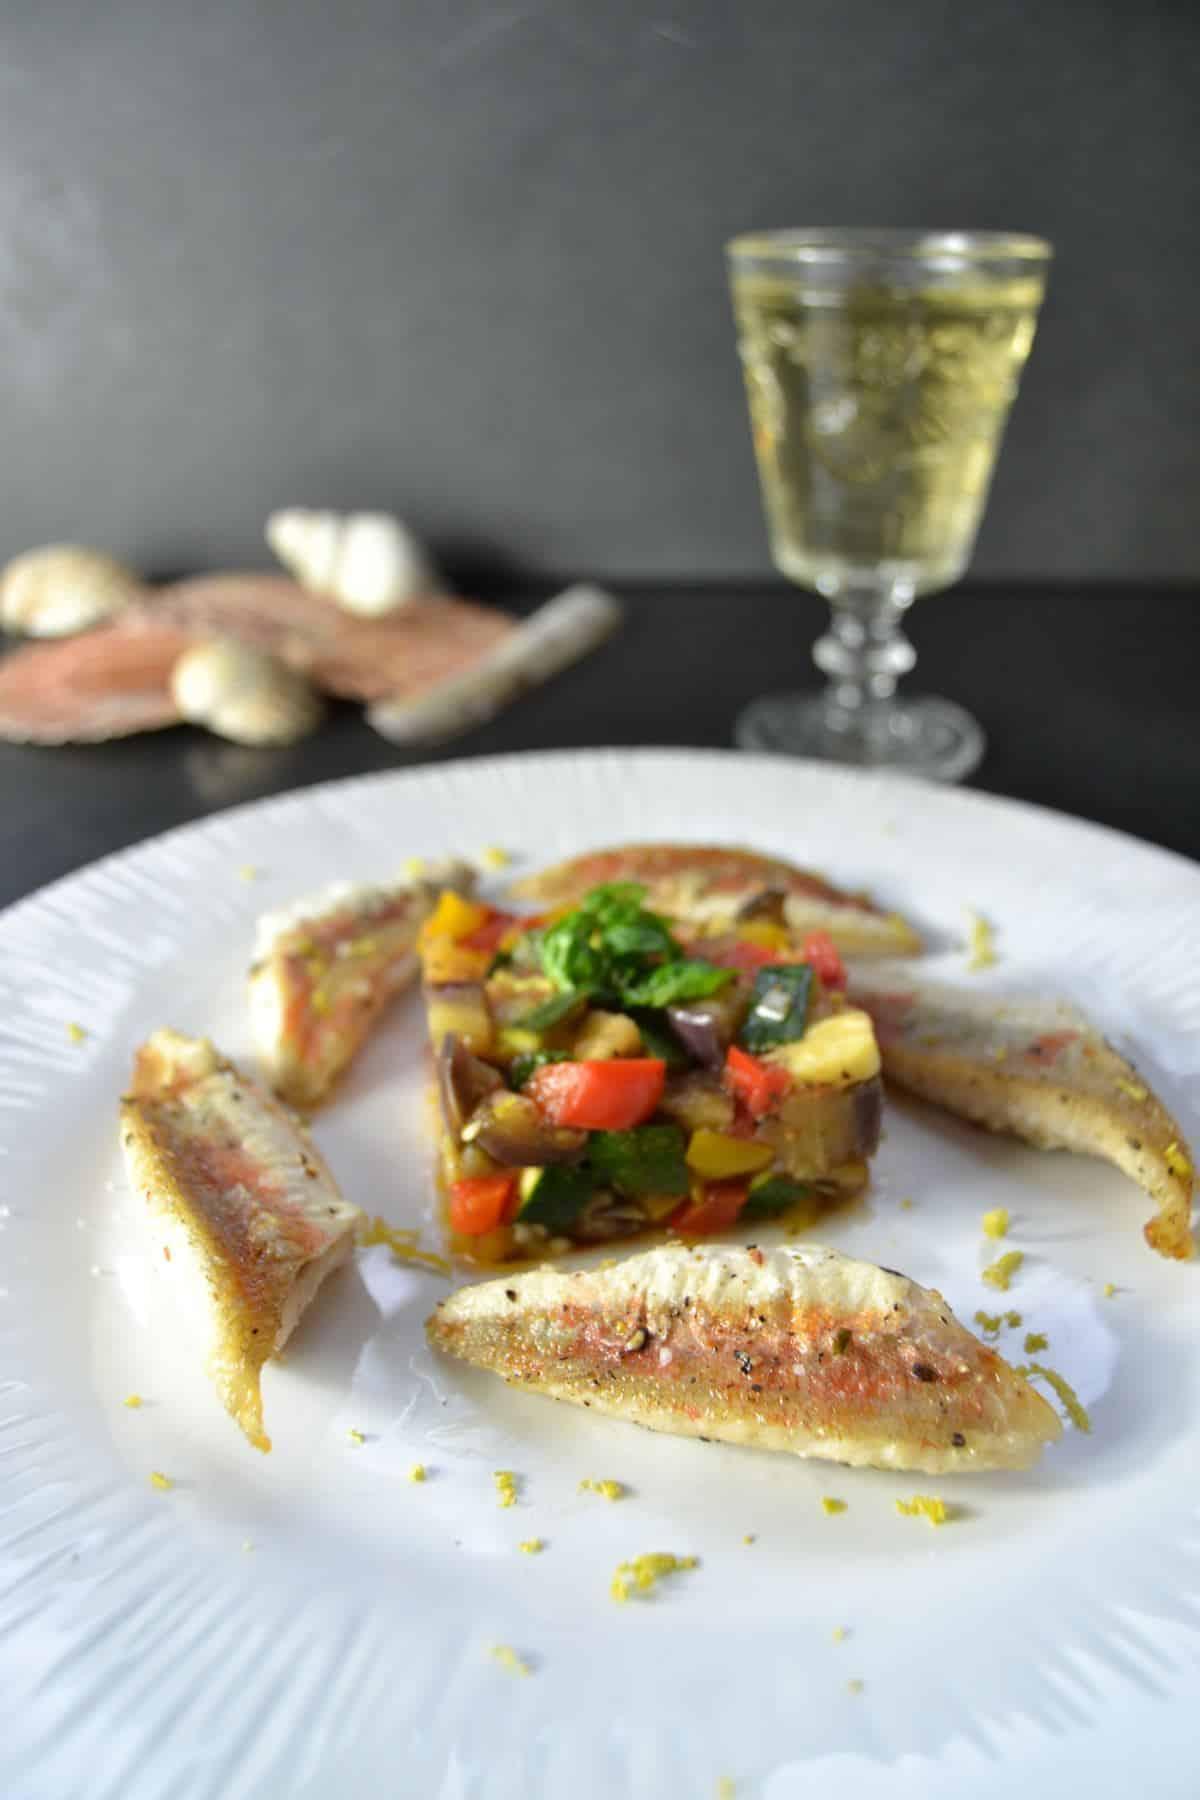 gebratene Rotbarbenfilets mit Ratatouille